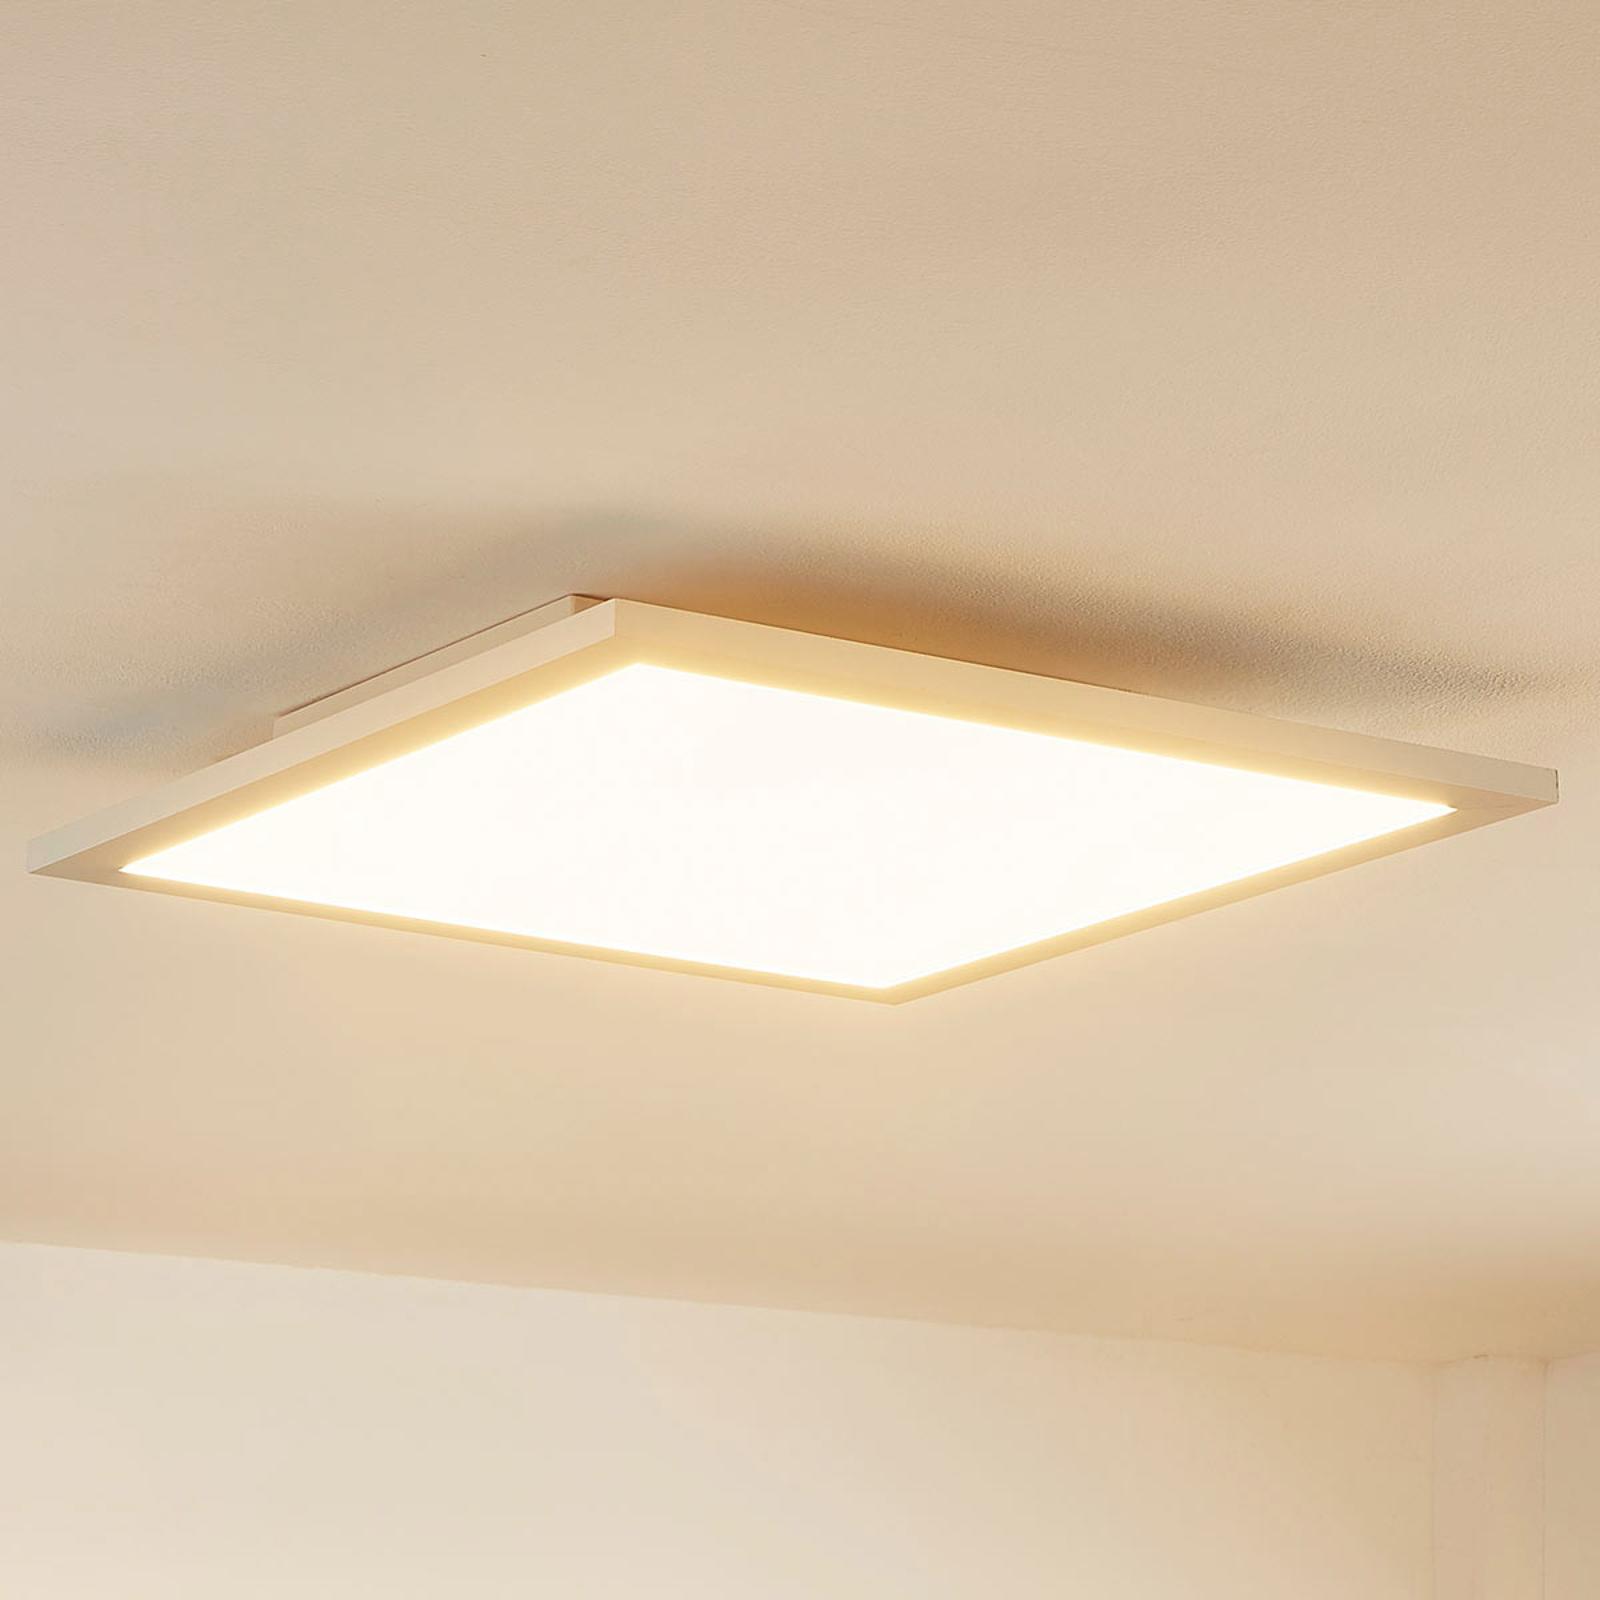 Arcchio Enja panel LED, 39,5 cm x 39,5 cm